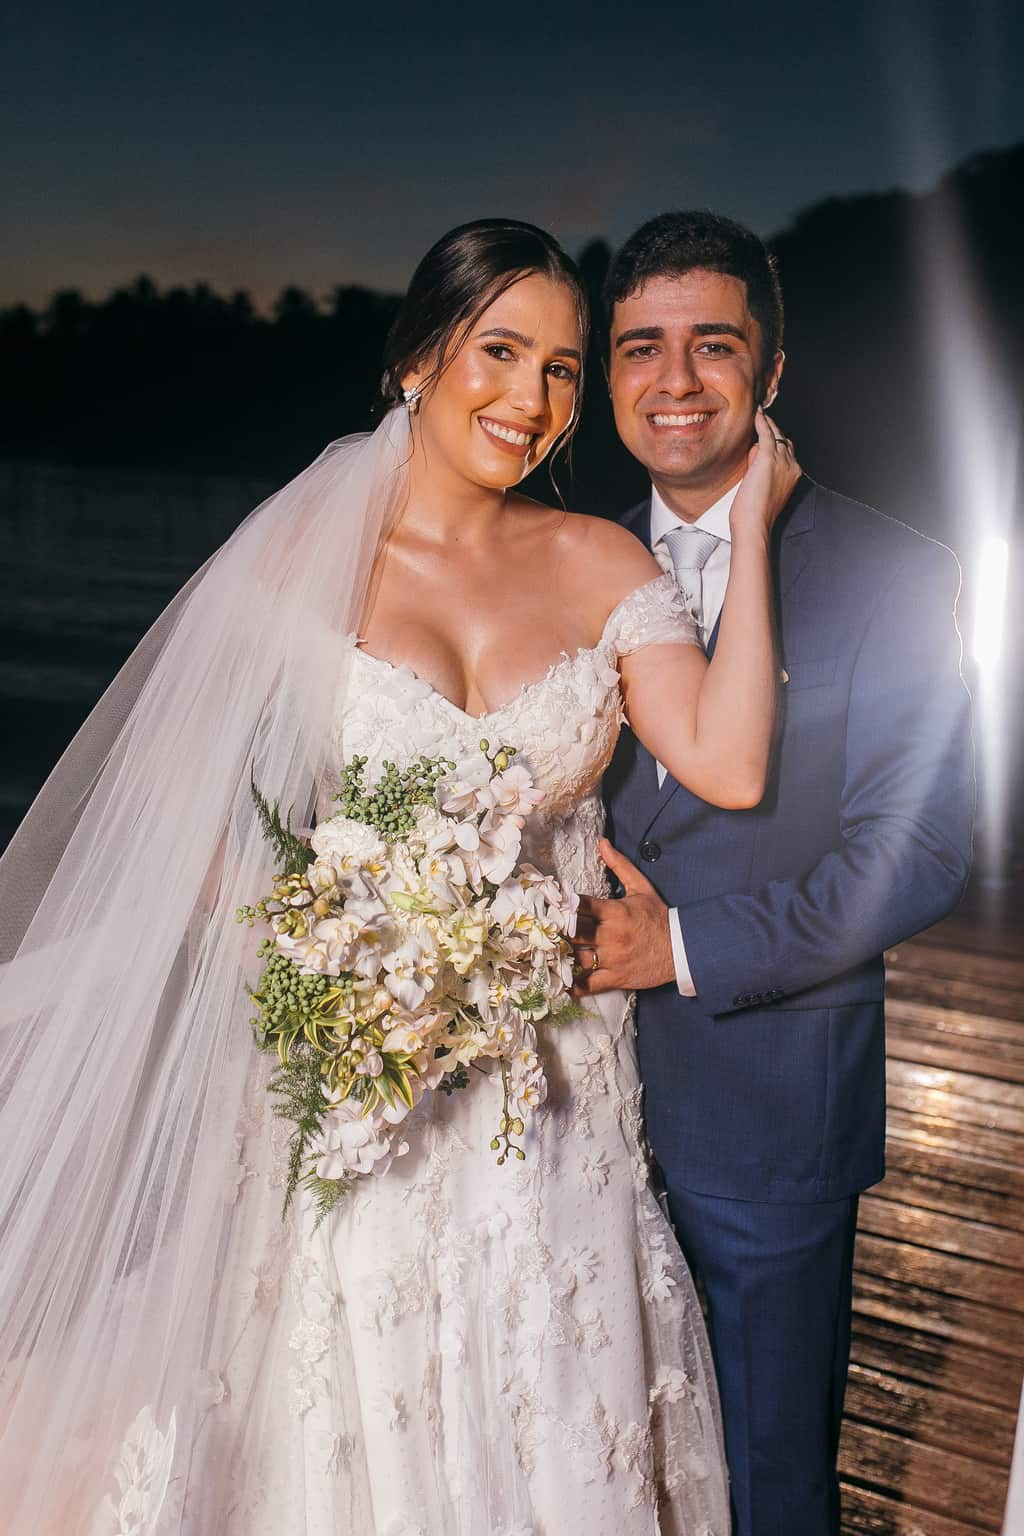 Casamento-Gardenia-e-Marcos-Antonio-Paulo-Bezerra-Joao-Curvelo-Carol-Maiorano0958